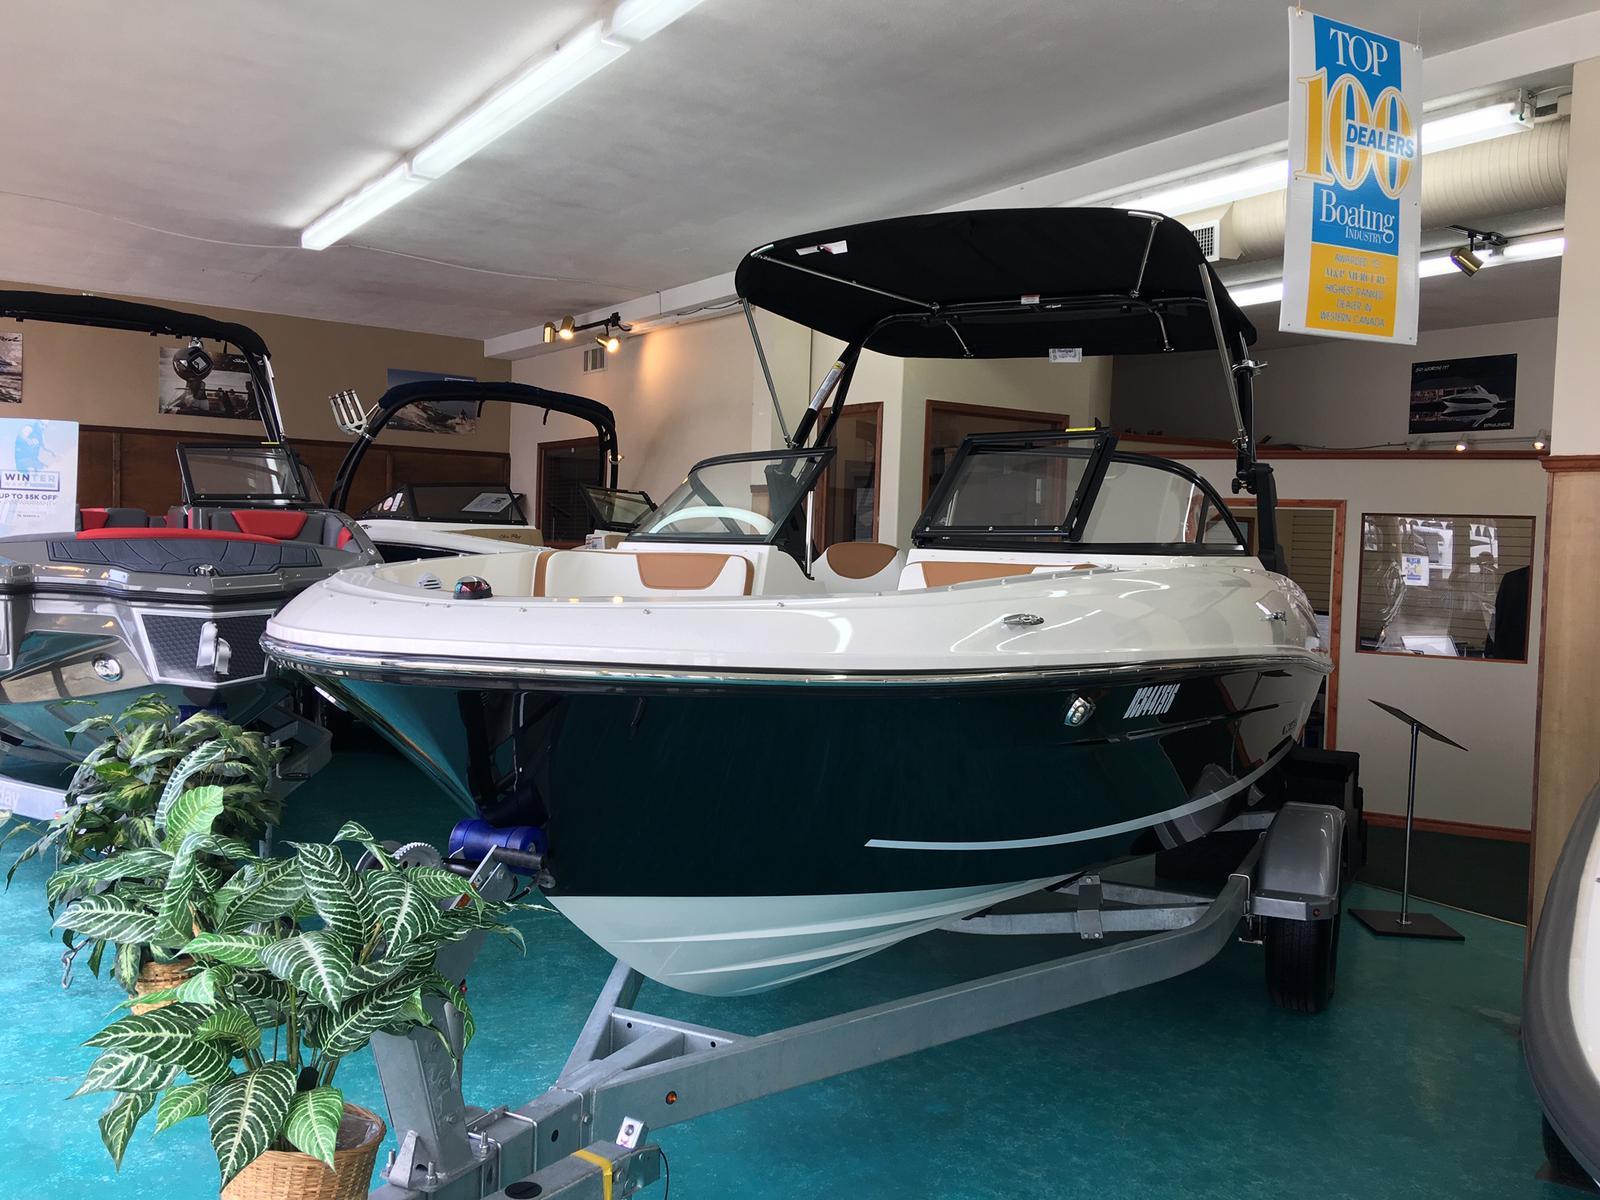 2019 Bayliner boat for sale, model of the boat is VR4 Bowrider & Image # 1 of 22